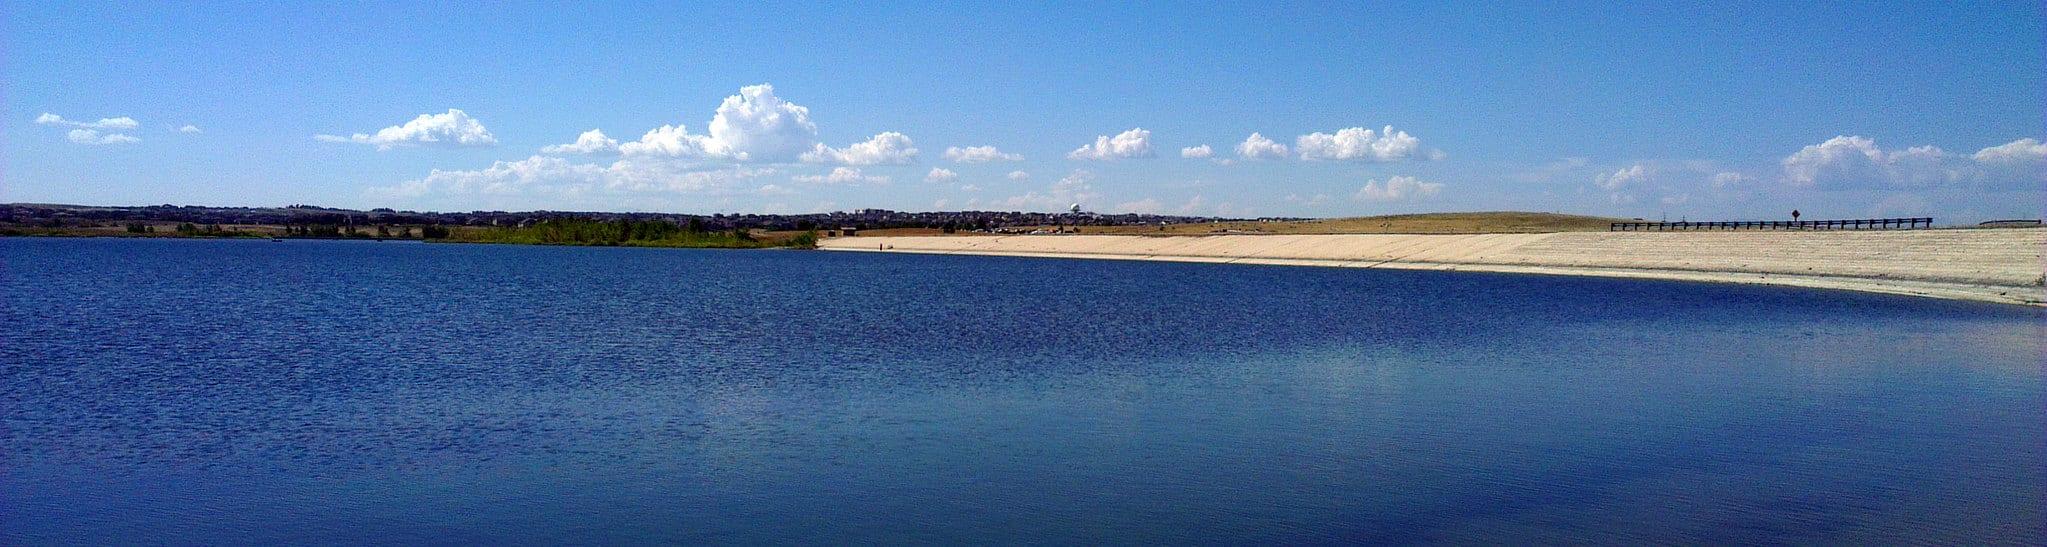 image of Aurora Reservoir